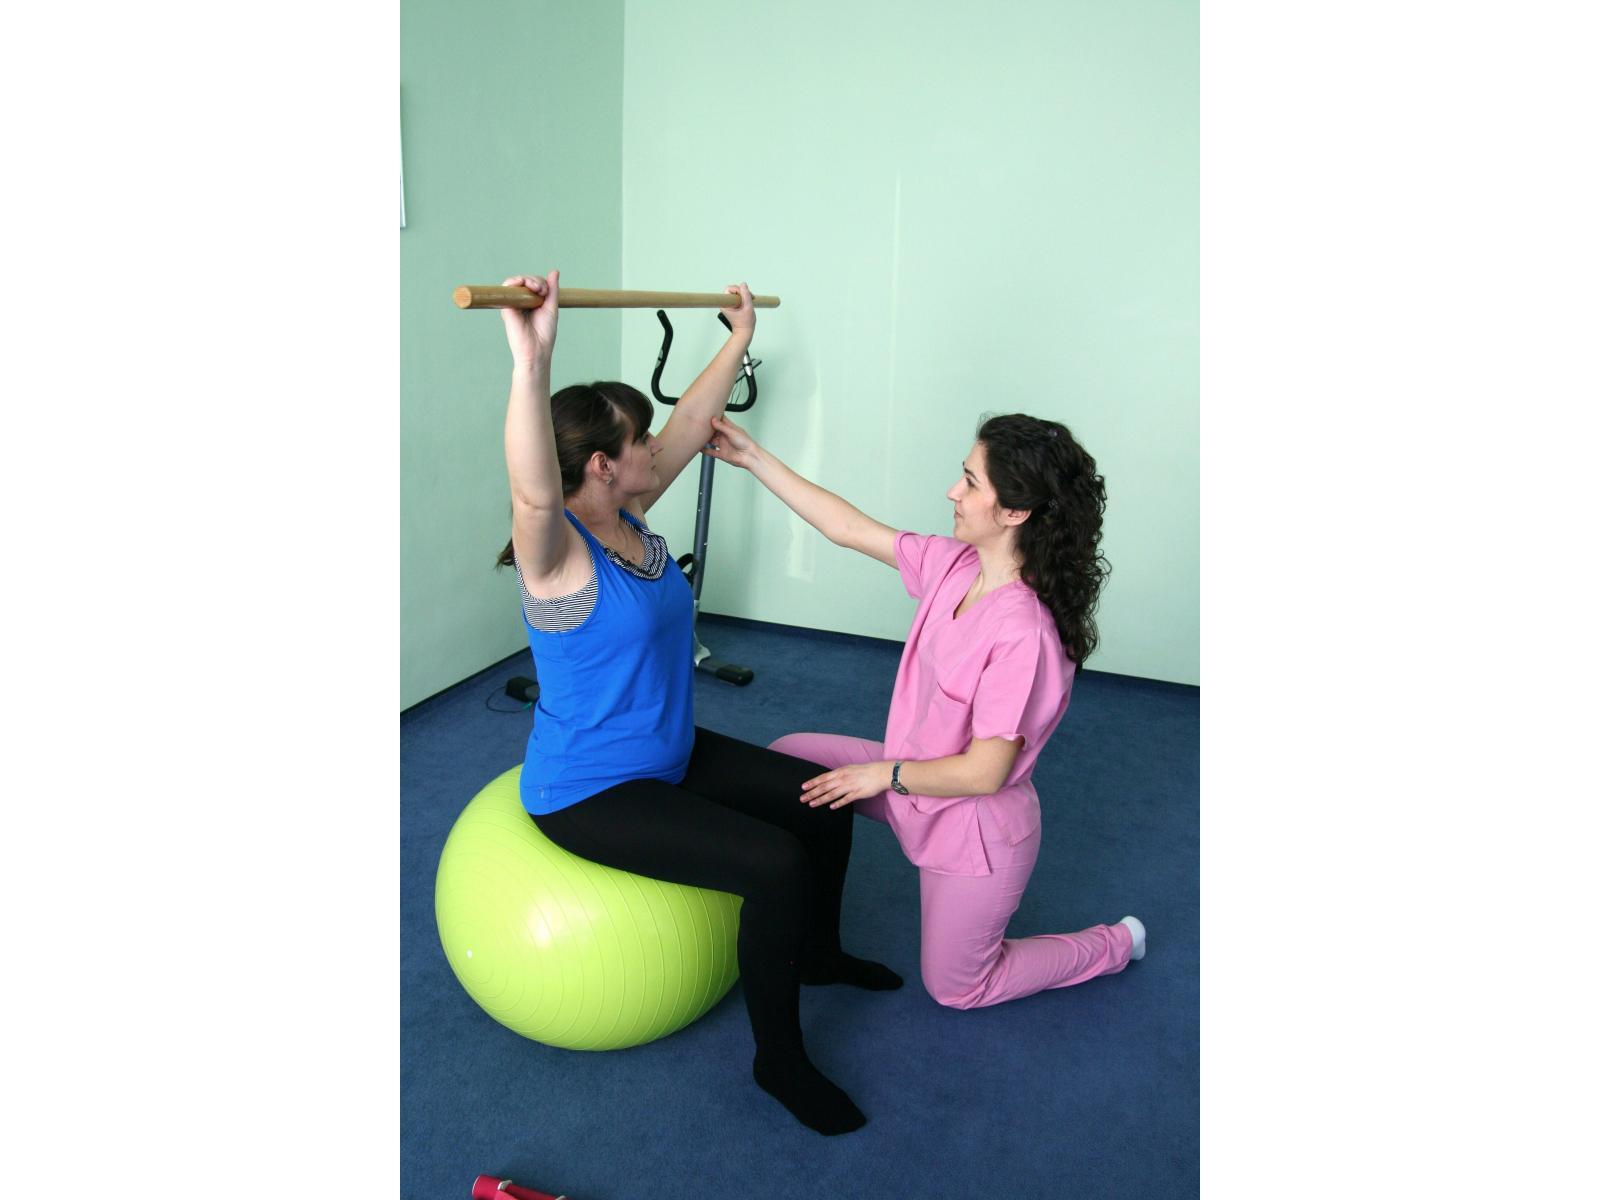 Clinica de Recuperare Motivation - IMG_6900.JPG